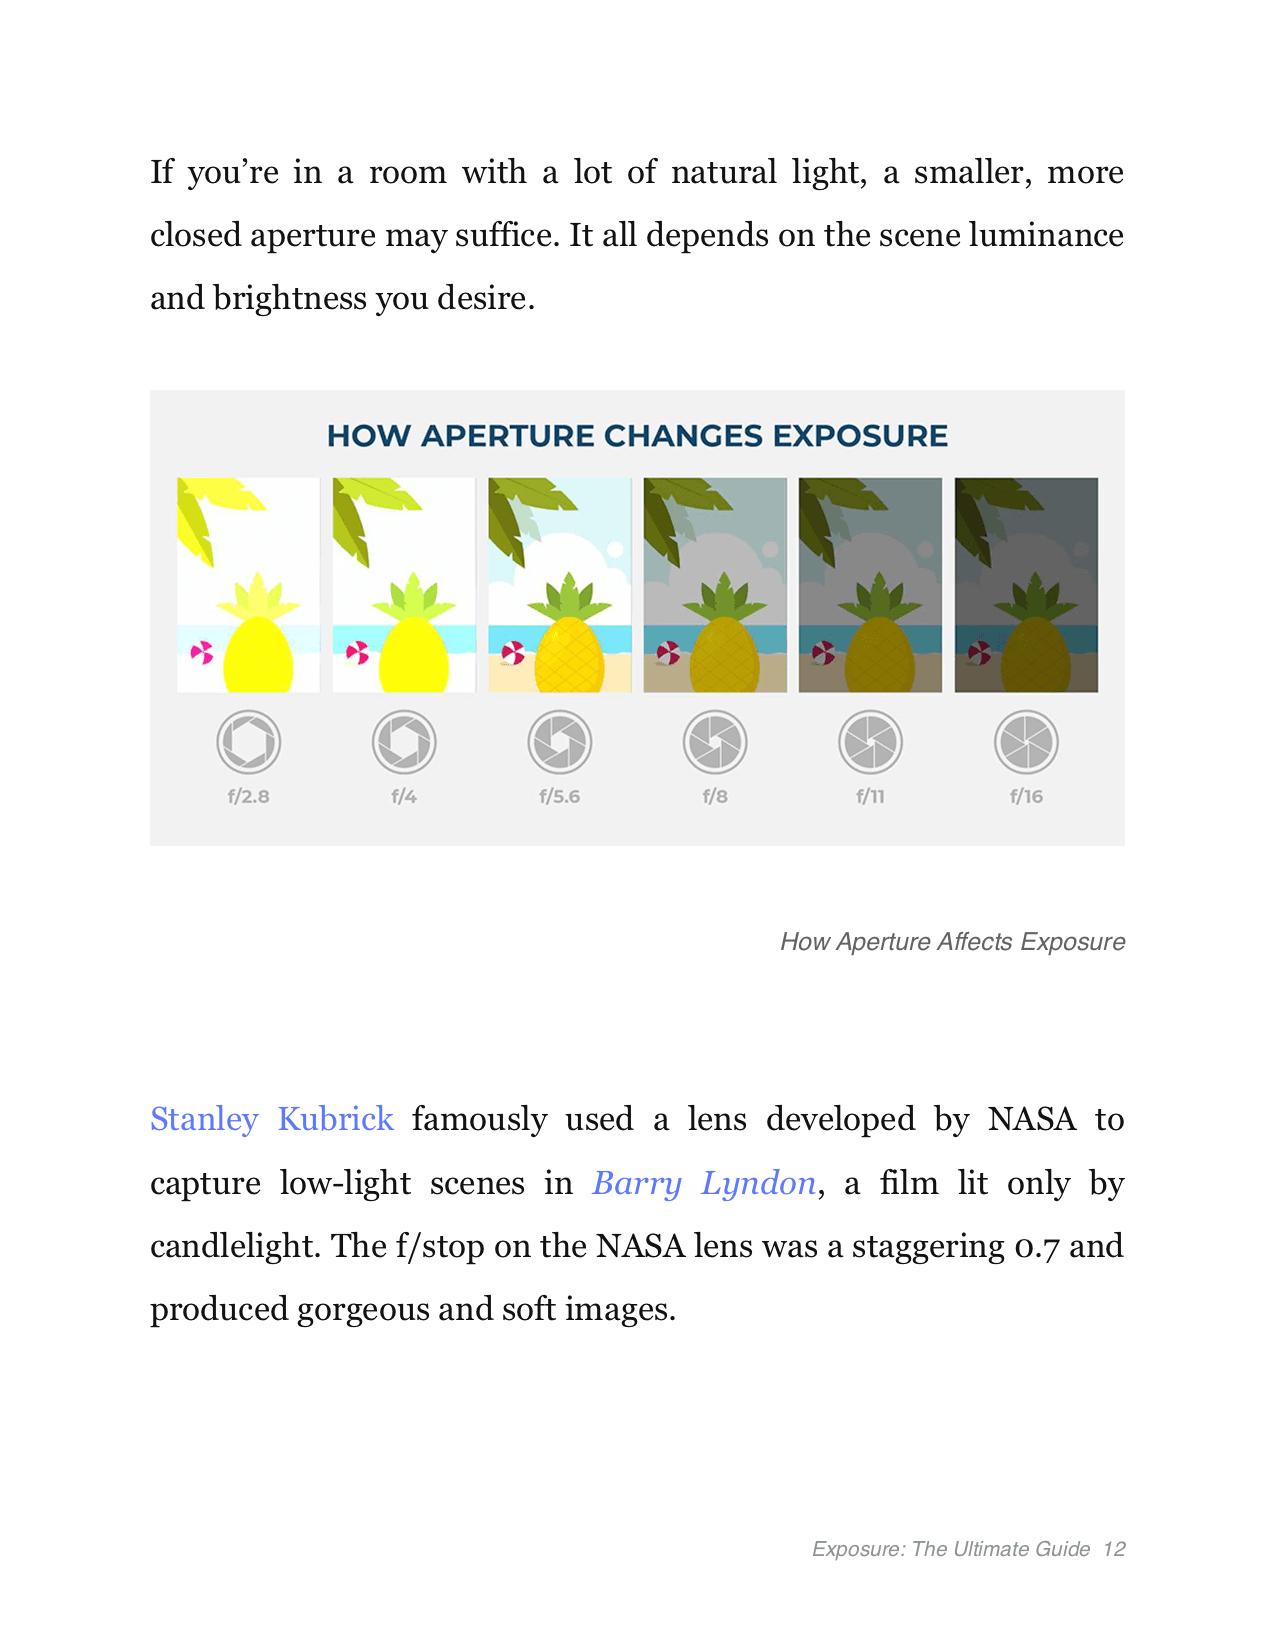 Exposure Triangle Ebook - The Ultimate Guide - Aperture Expose